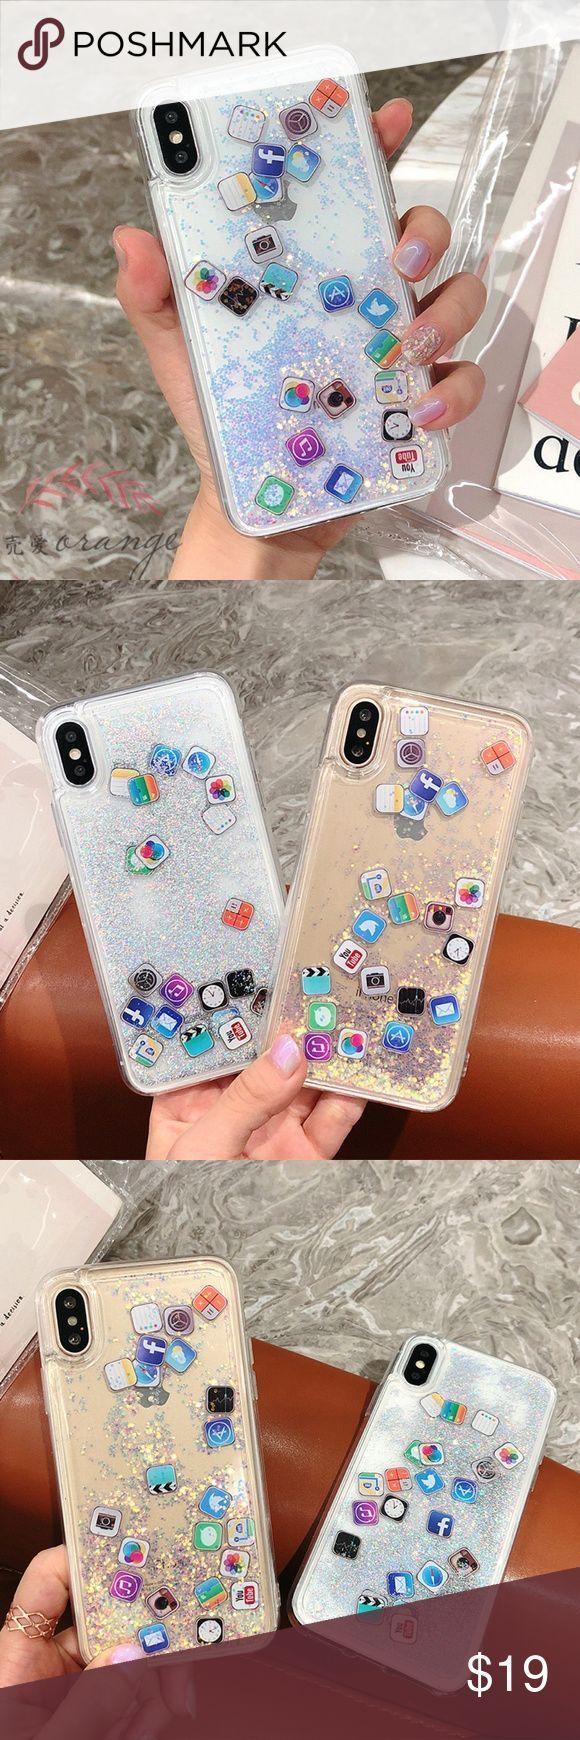 ️️NEW iPhone X/7/8/7+/8+ Glitter Liquid Icon Case ️️ BRAND